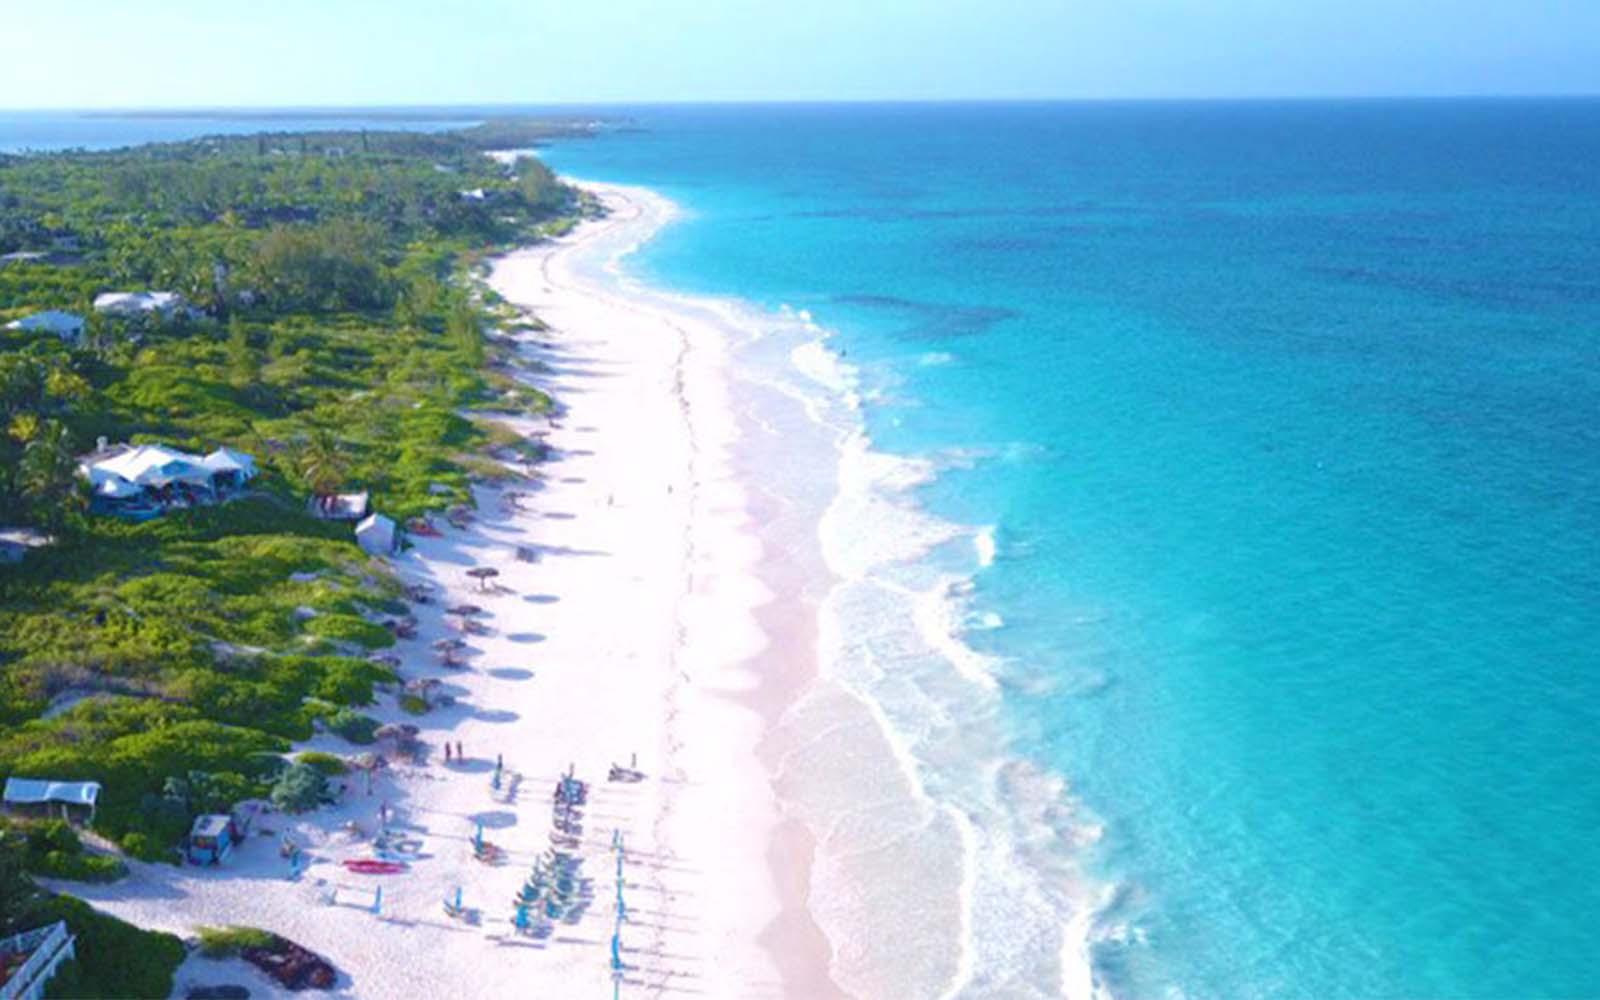 Halbour Island Bahamas - boat shopping